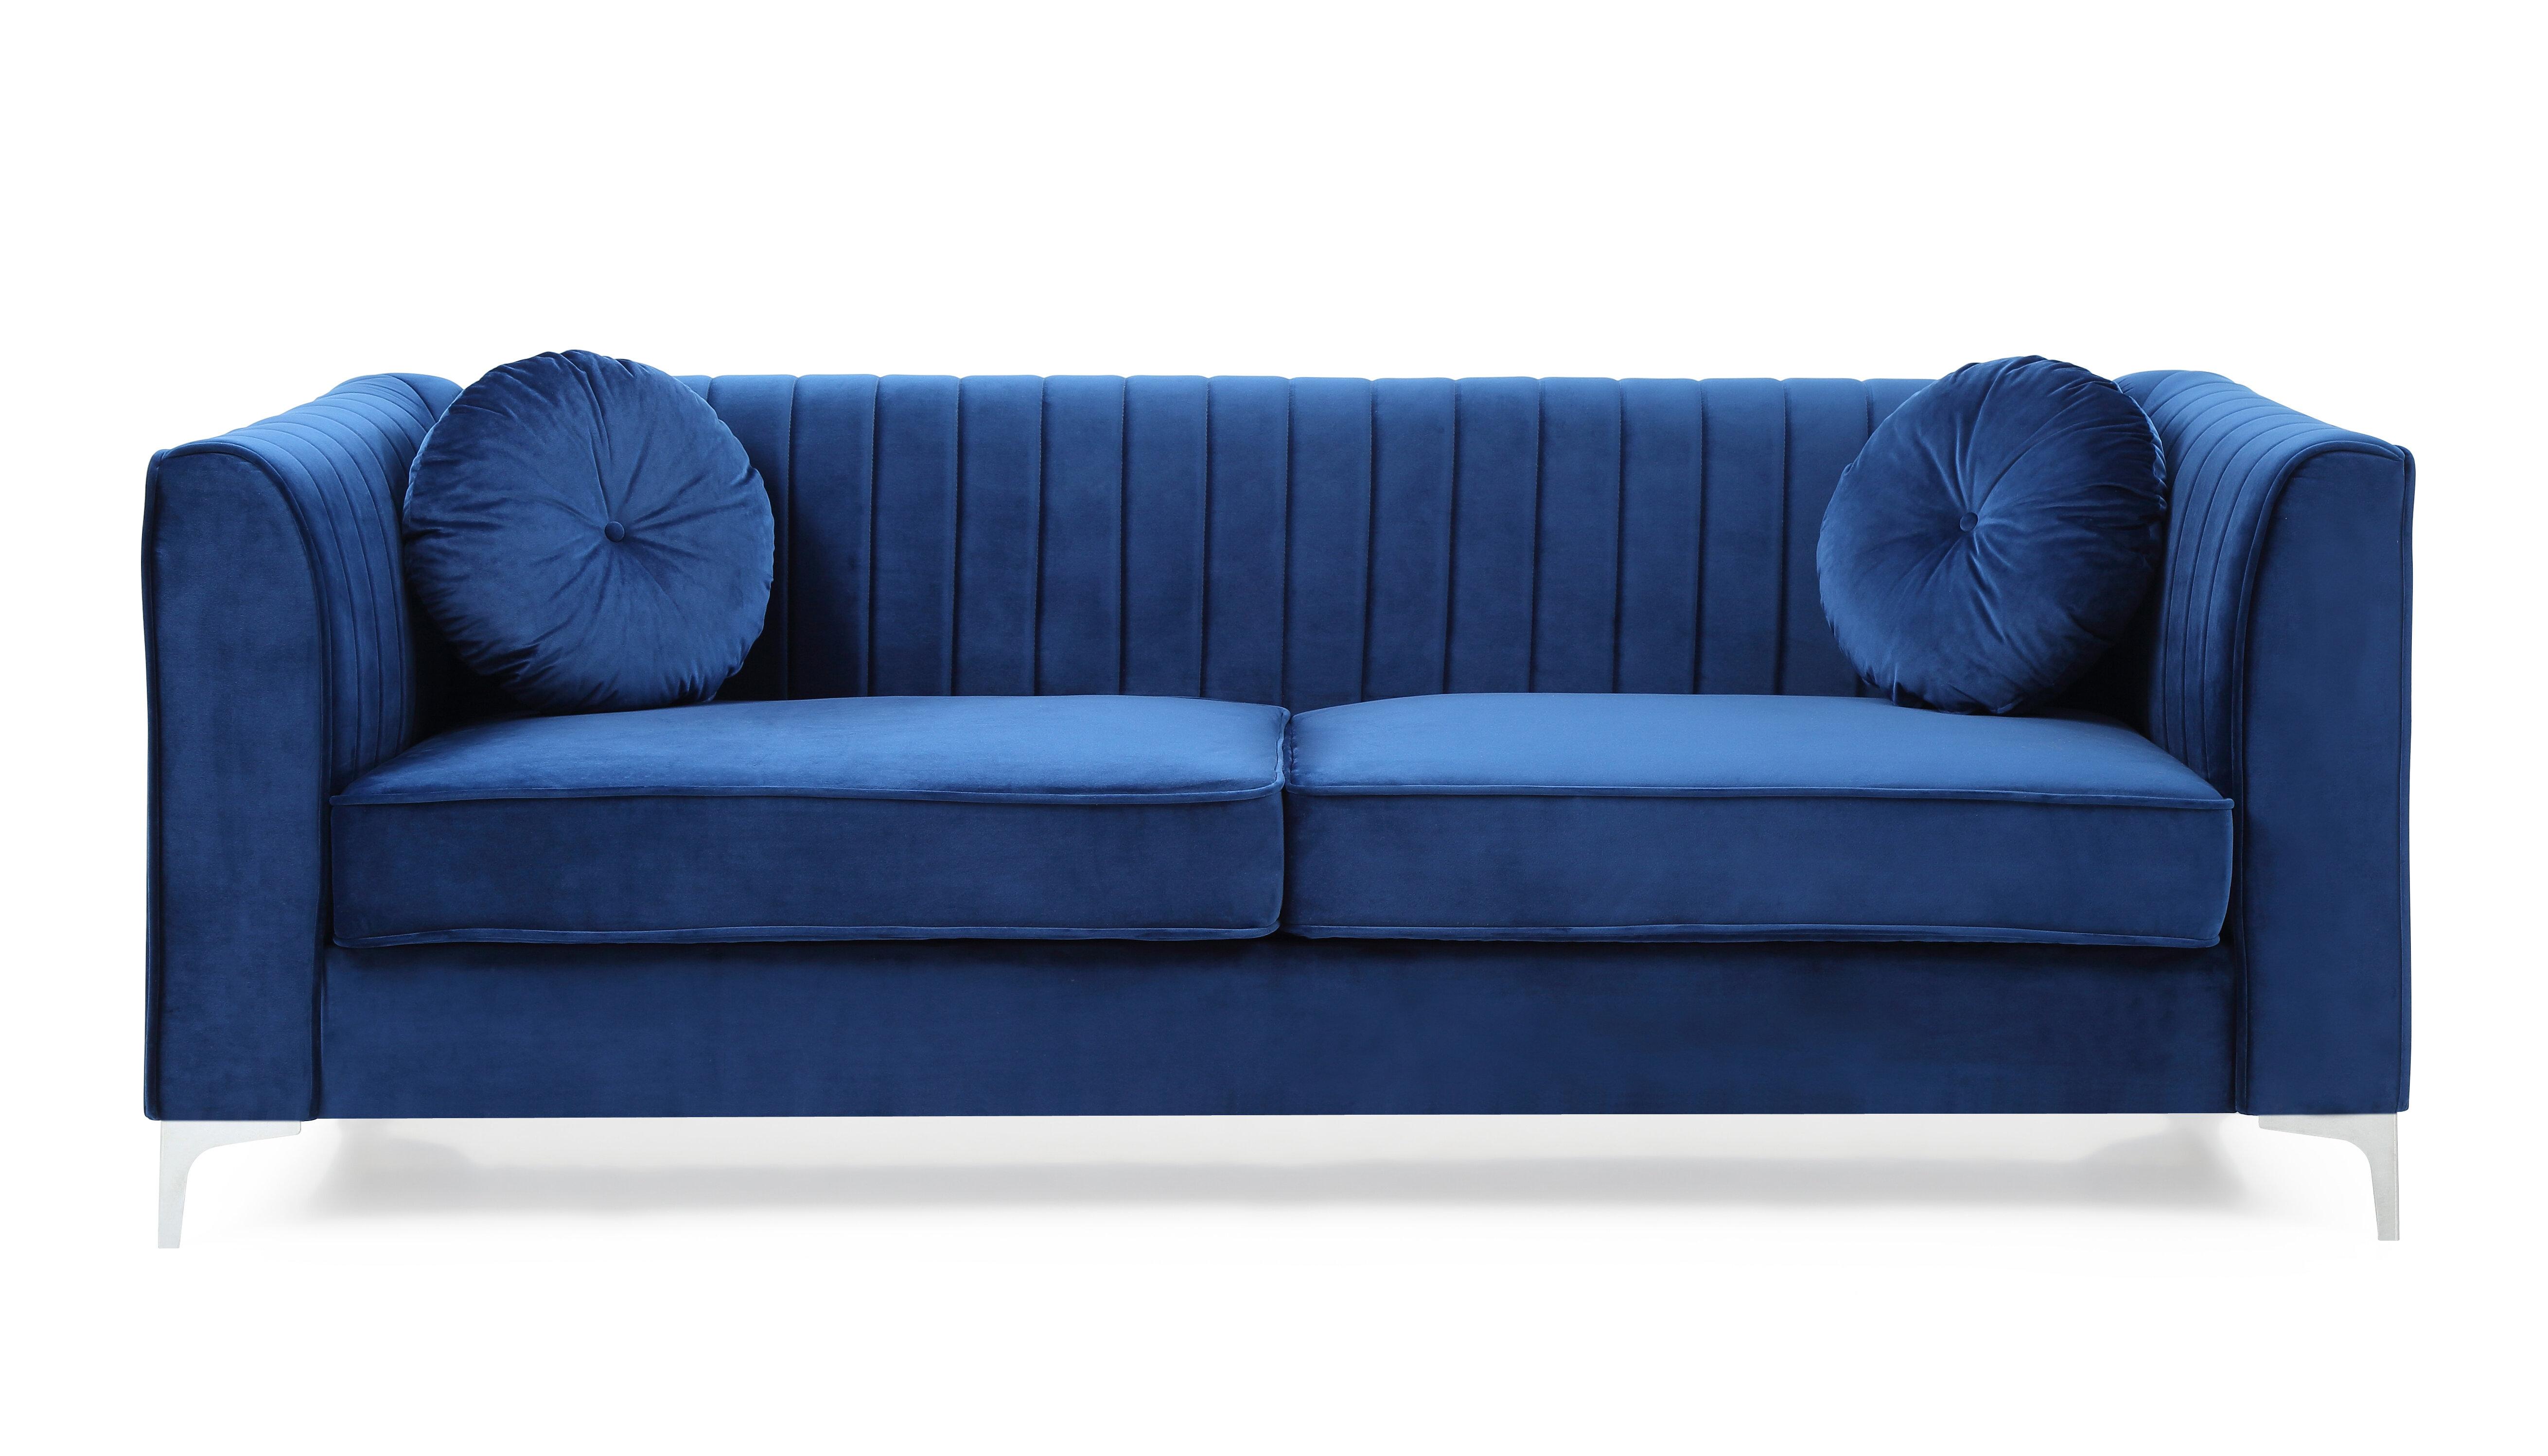 Mercer41 Adhafera 87 Wide Velvet Square Arm Sofa Reviews Wayfair